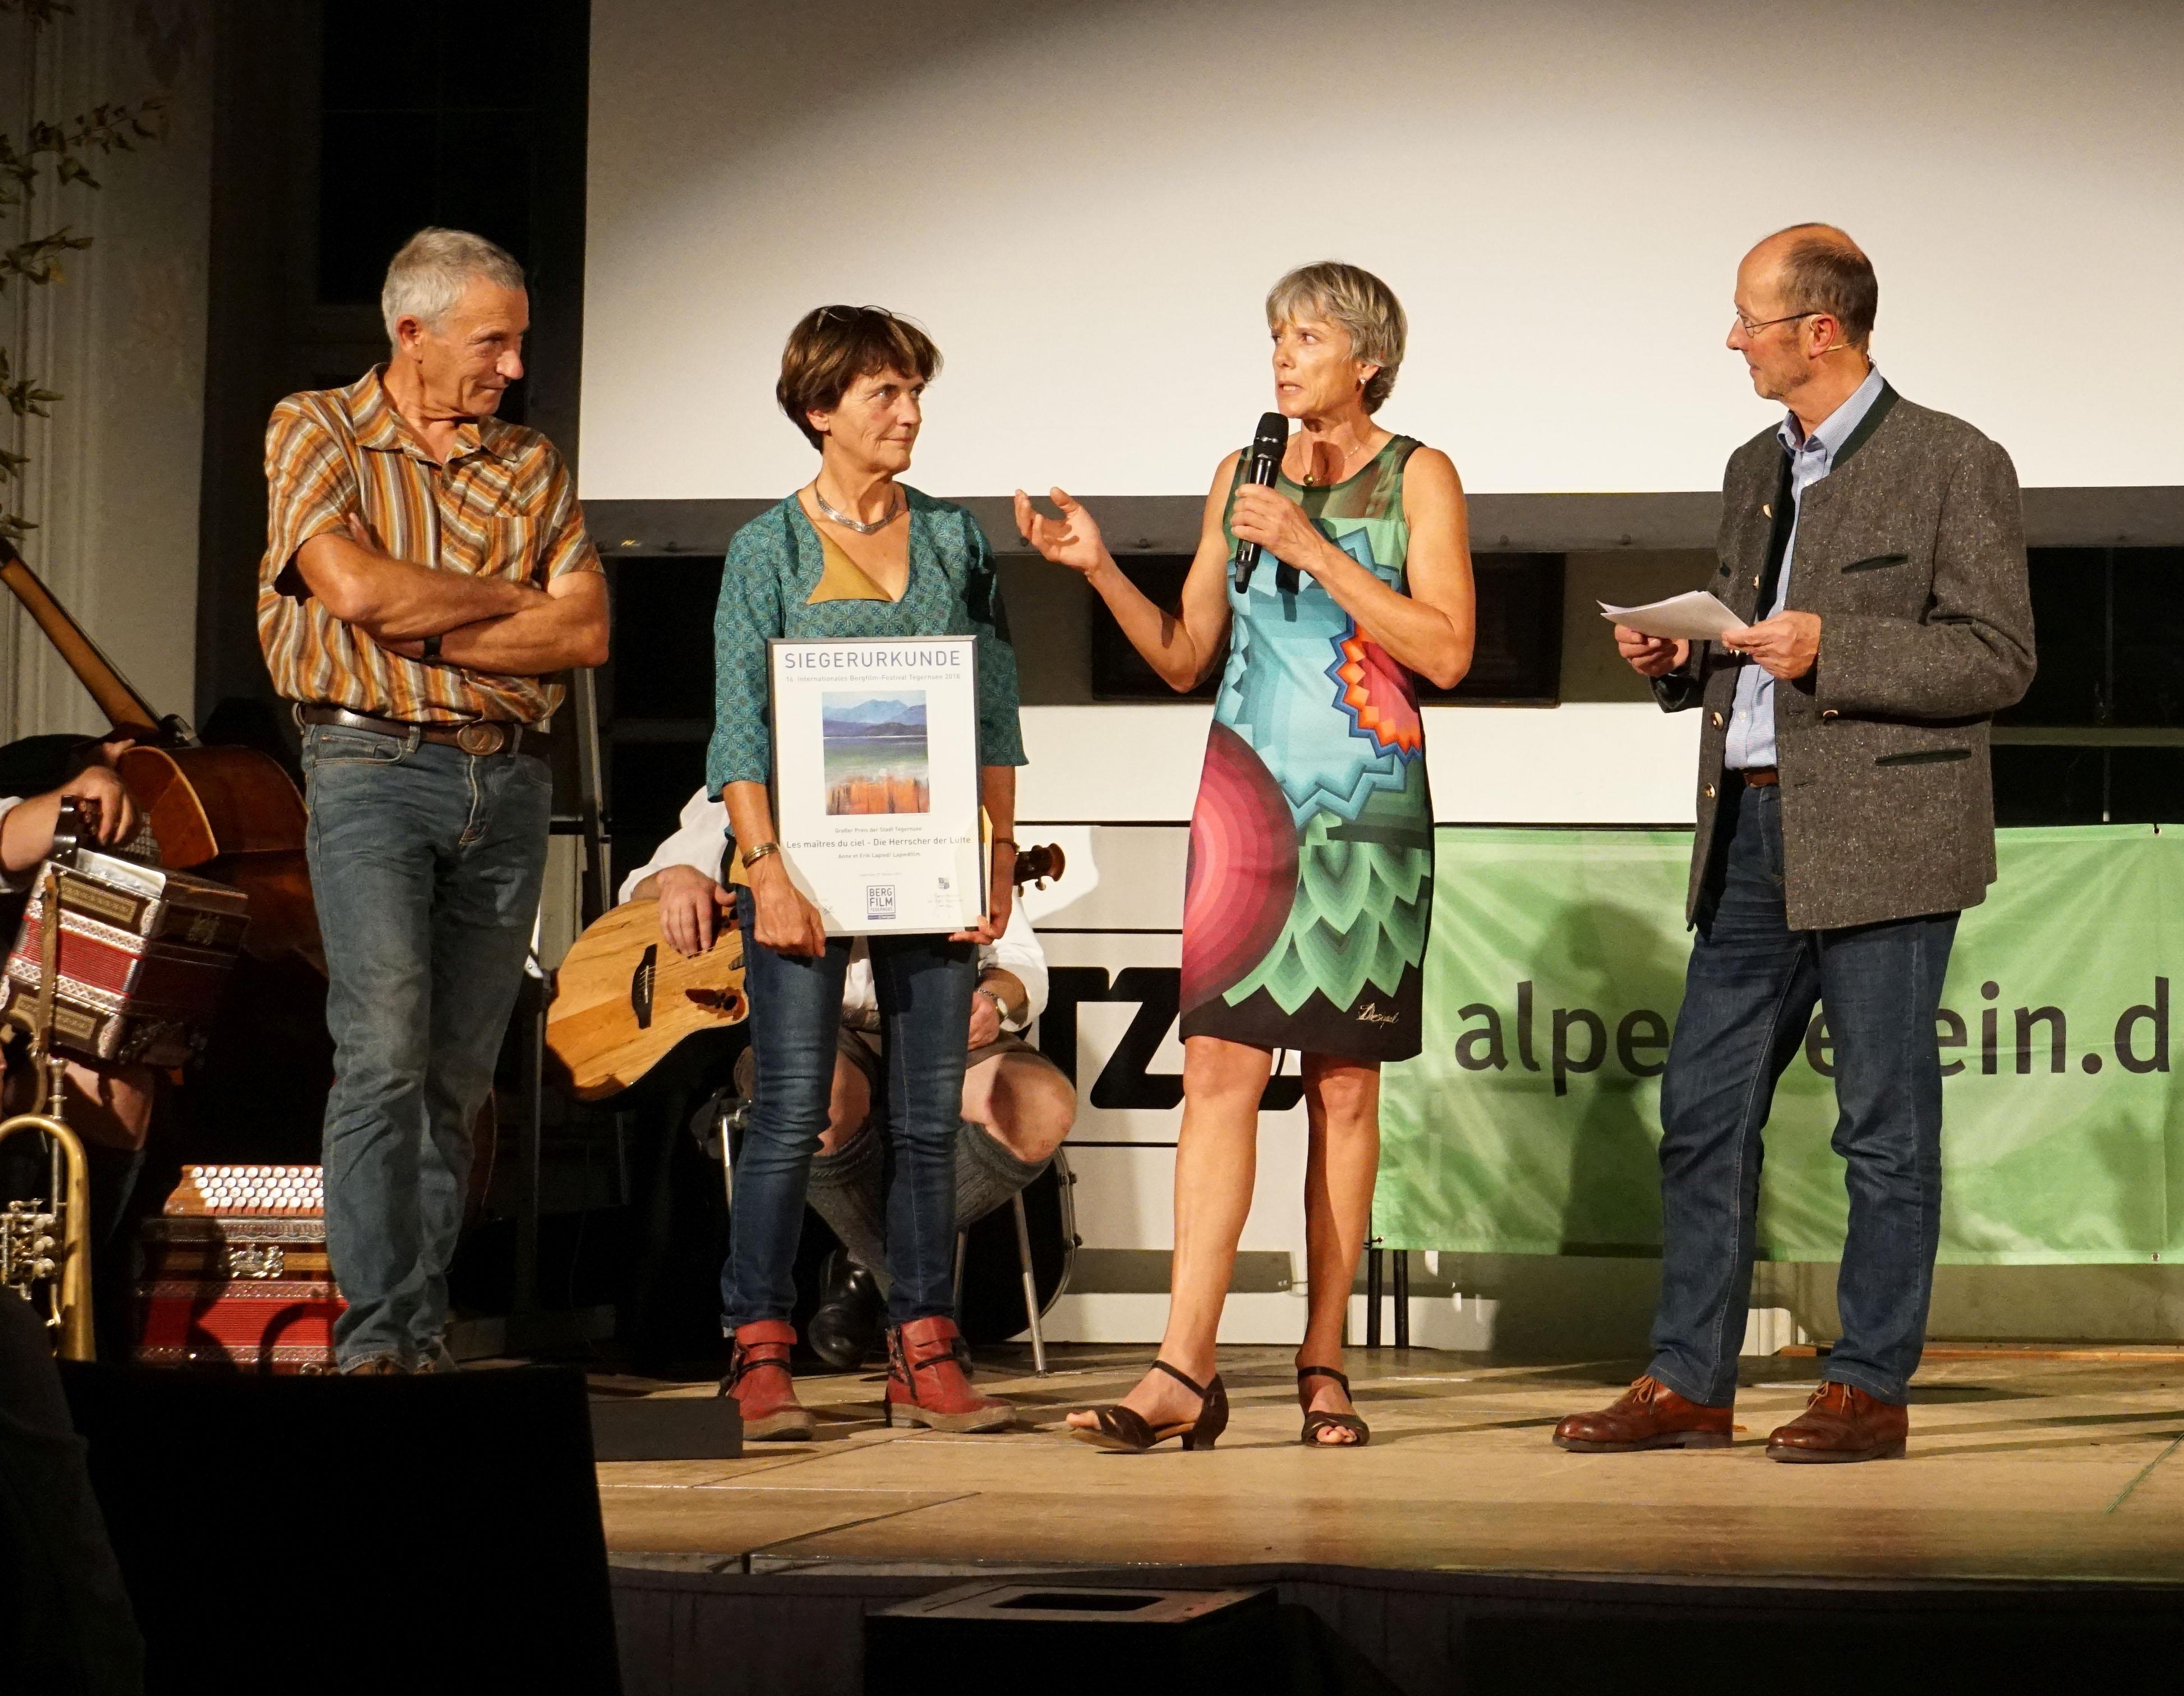 (v.l.n.r.) Anne und Erik Lapied, Jury-Mitglied Christine Kopp, Festival-Direktor Michael Pause